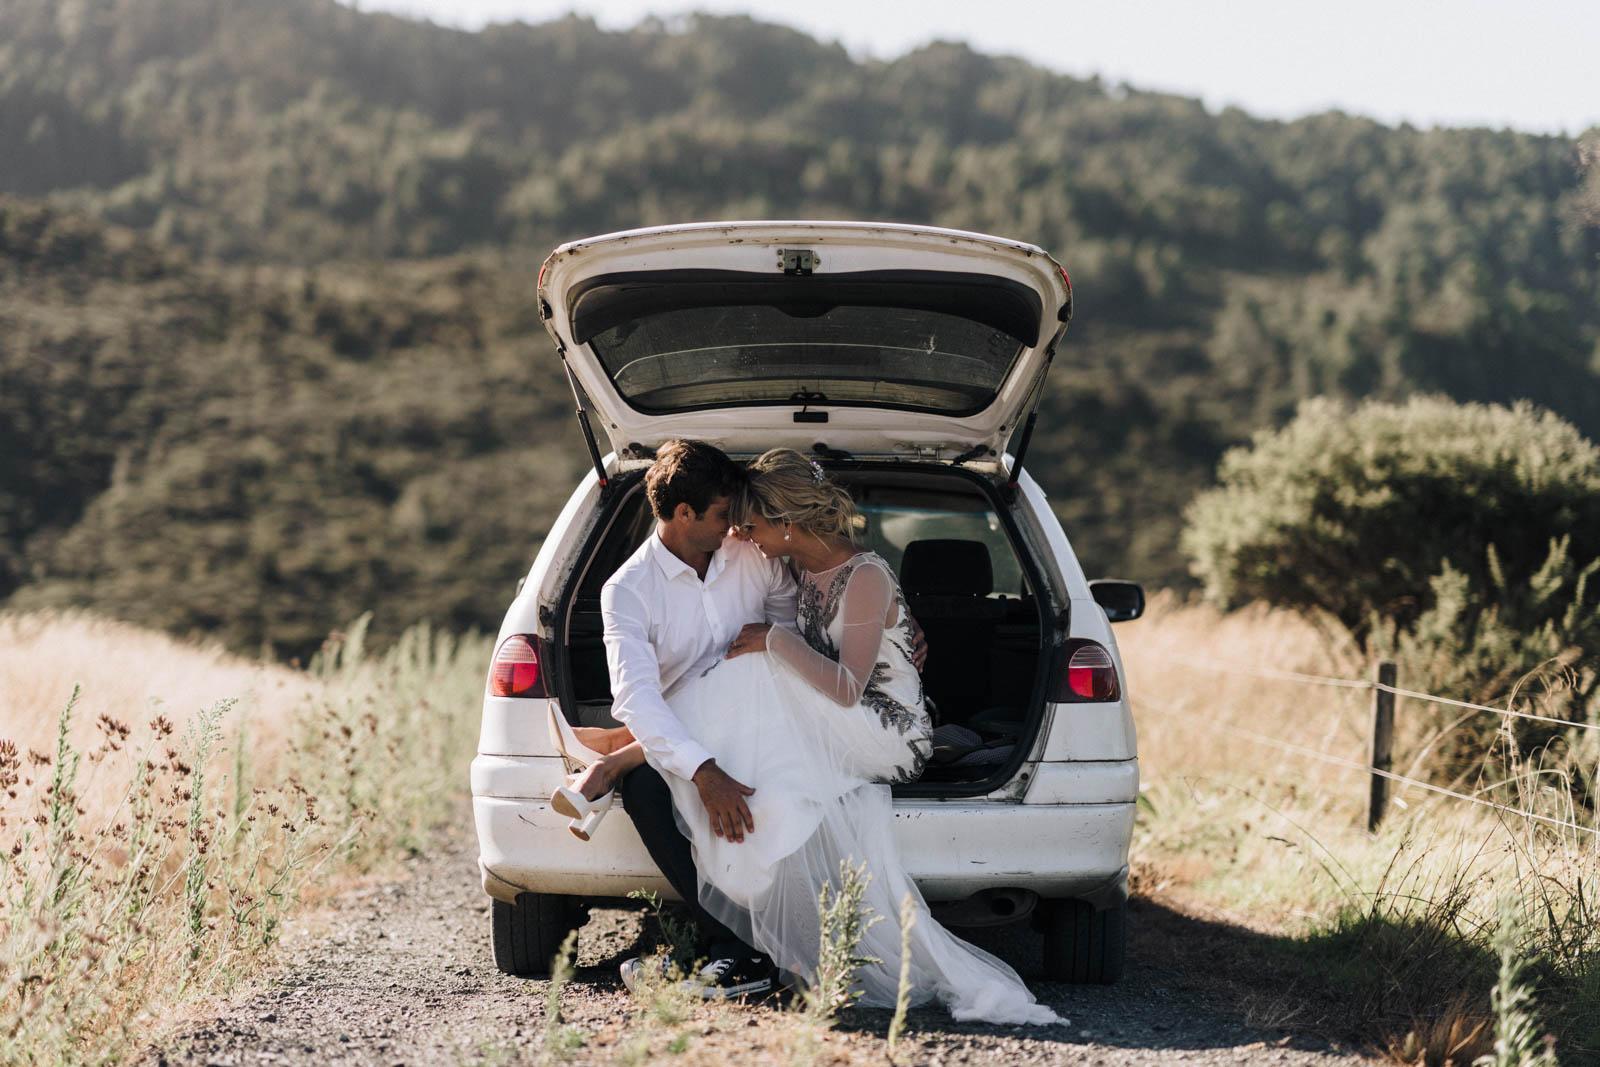 newfound-l-i-coromandel-wedding-photographer-1759-A9_04020